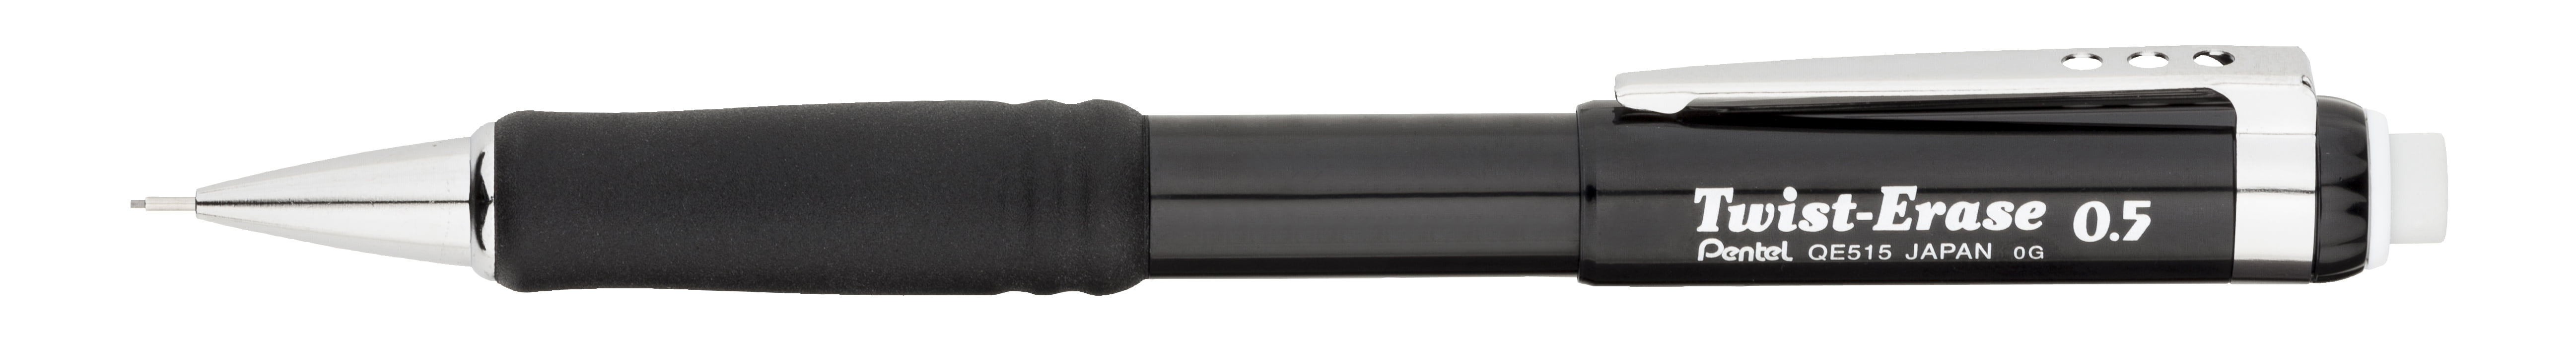 Pentel Twist-Erase III Mechanical Pencil (0.5mm), Black Barrel